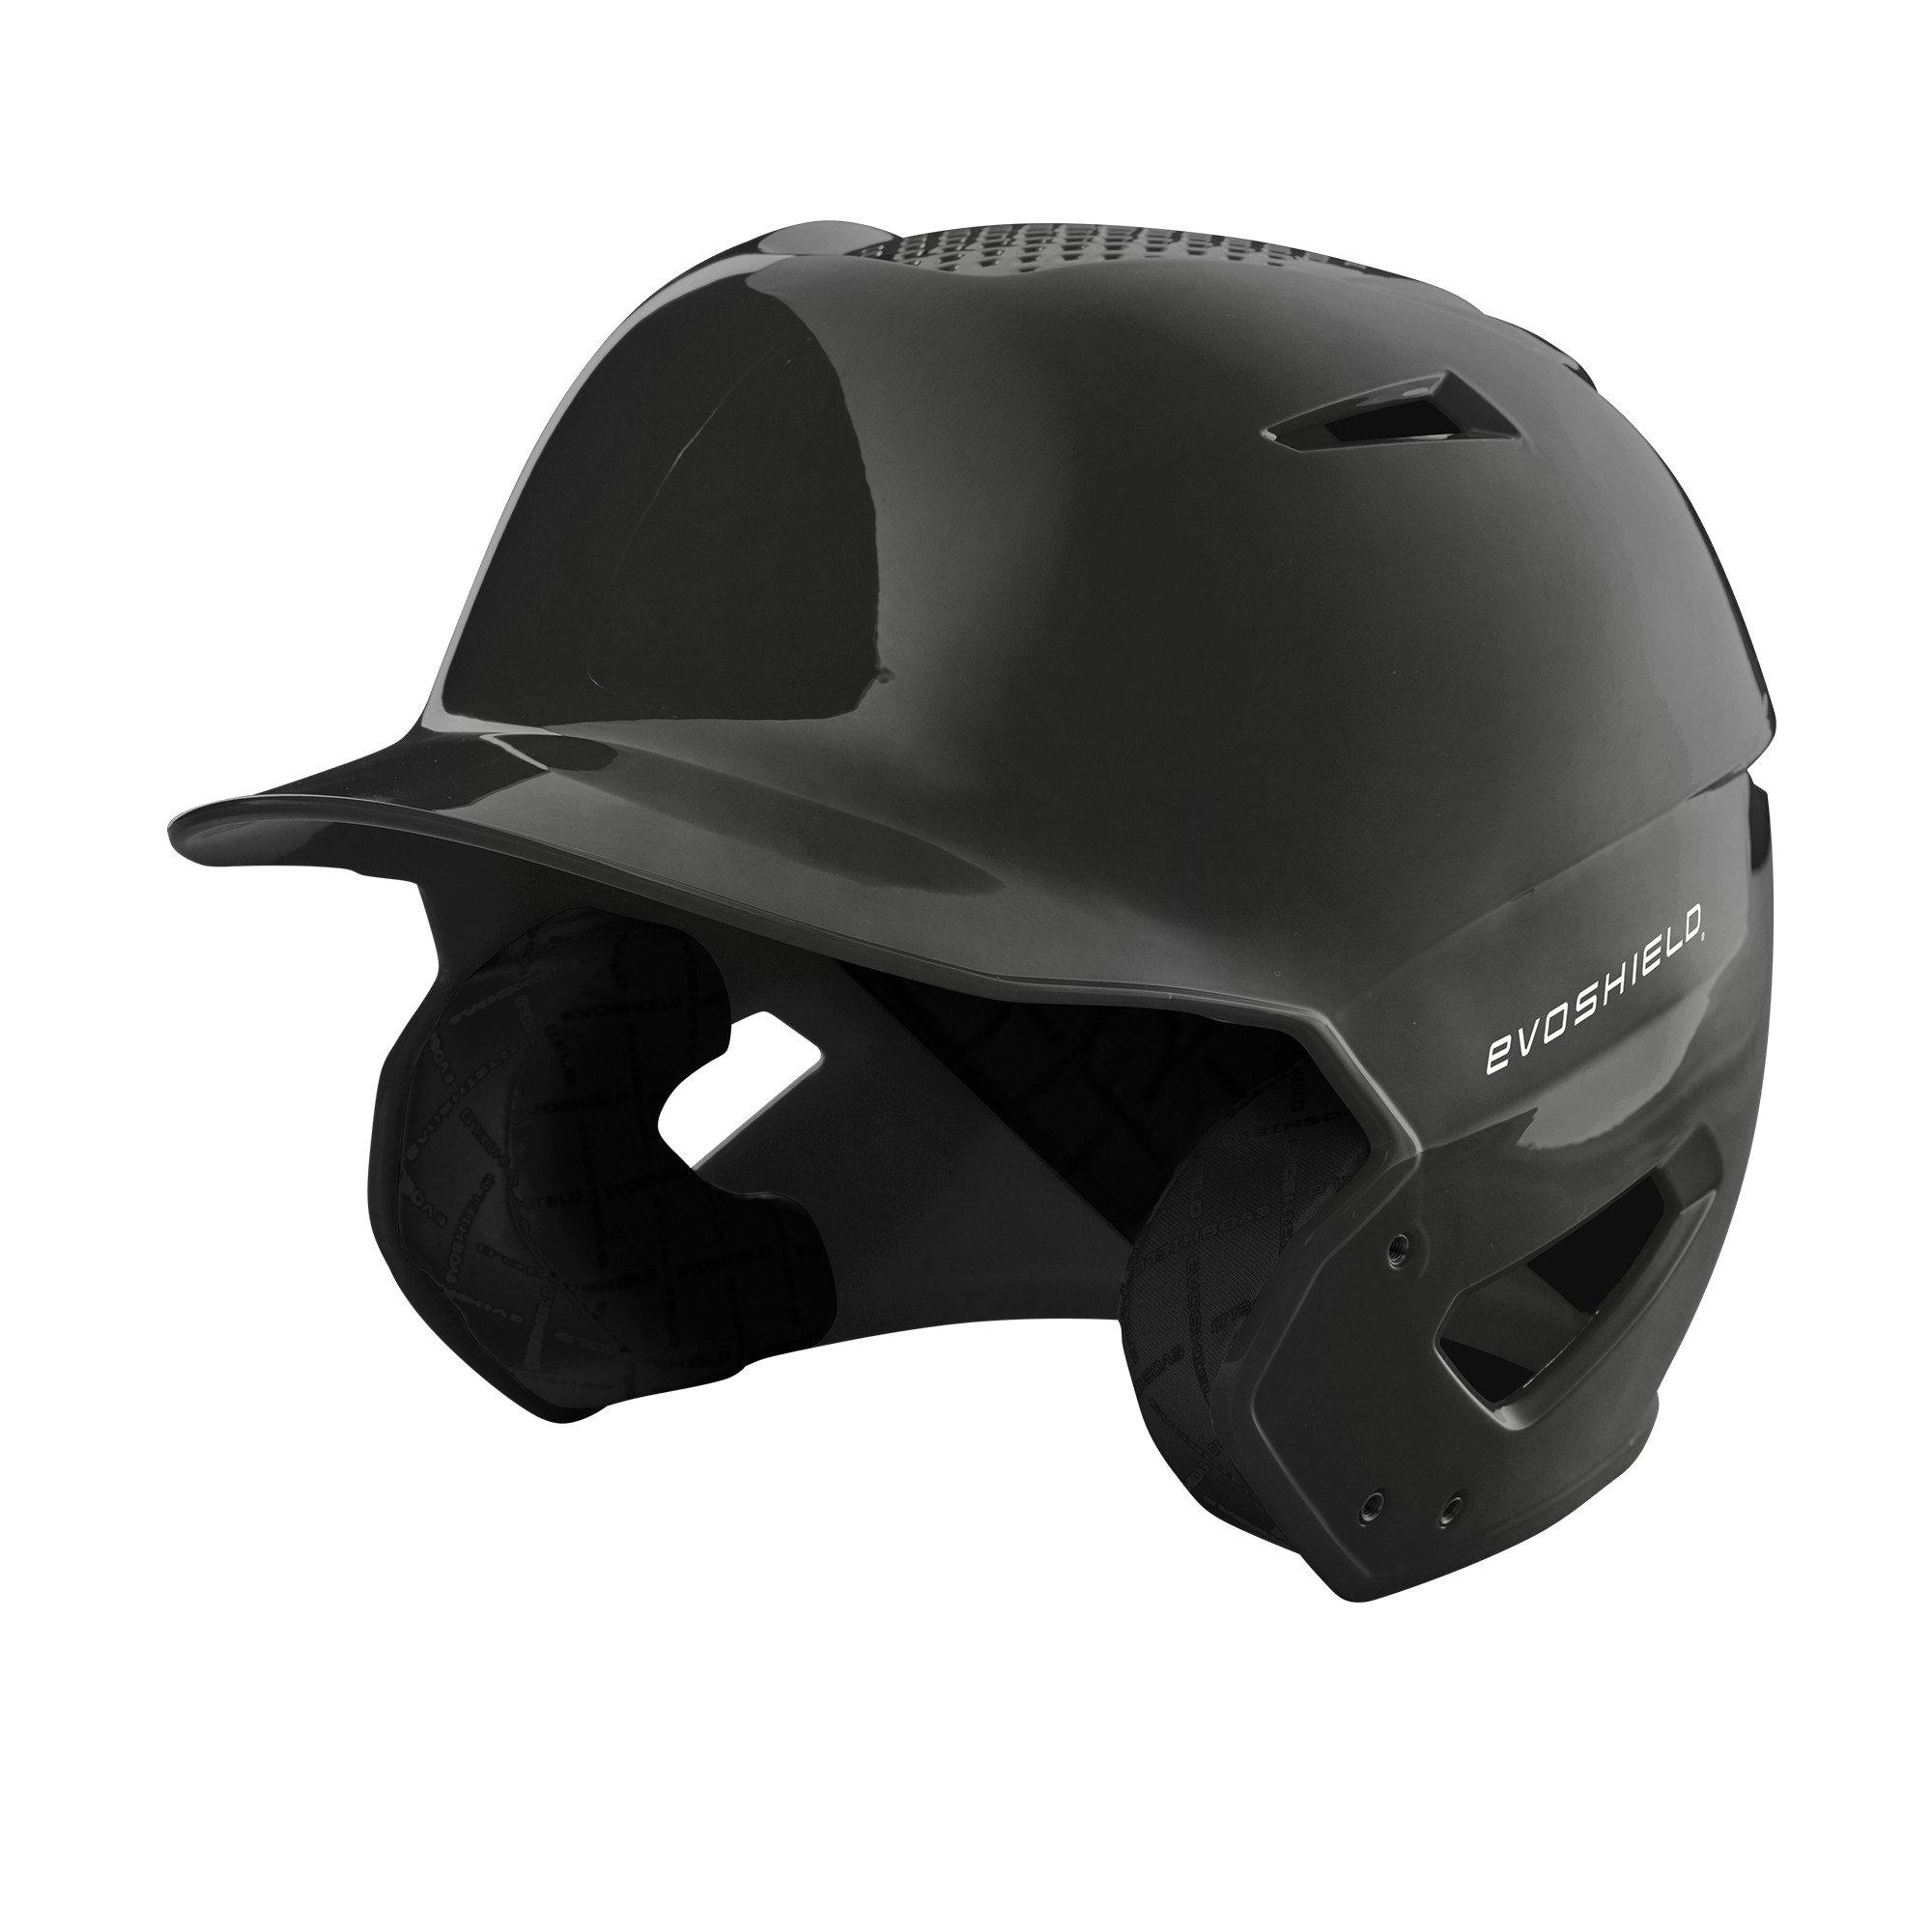 EvoShield XVT Batting Helmet, Black - S-M by EvoShield